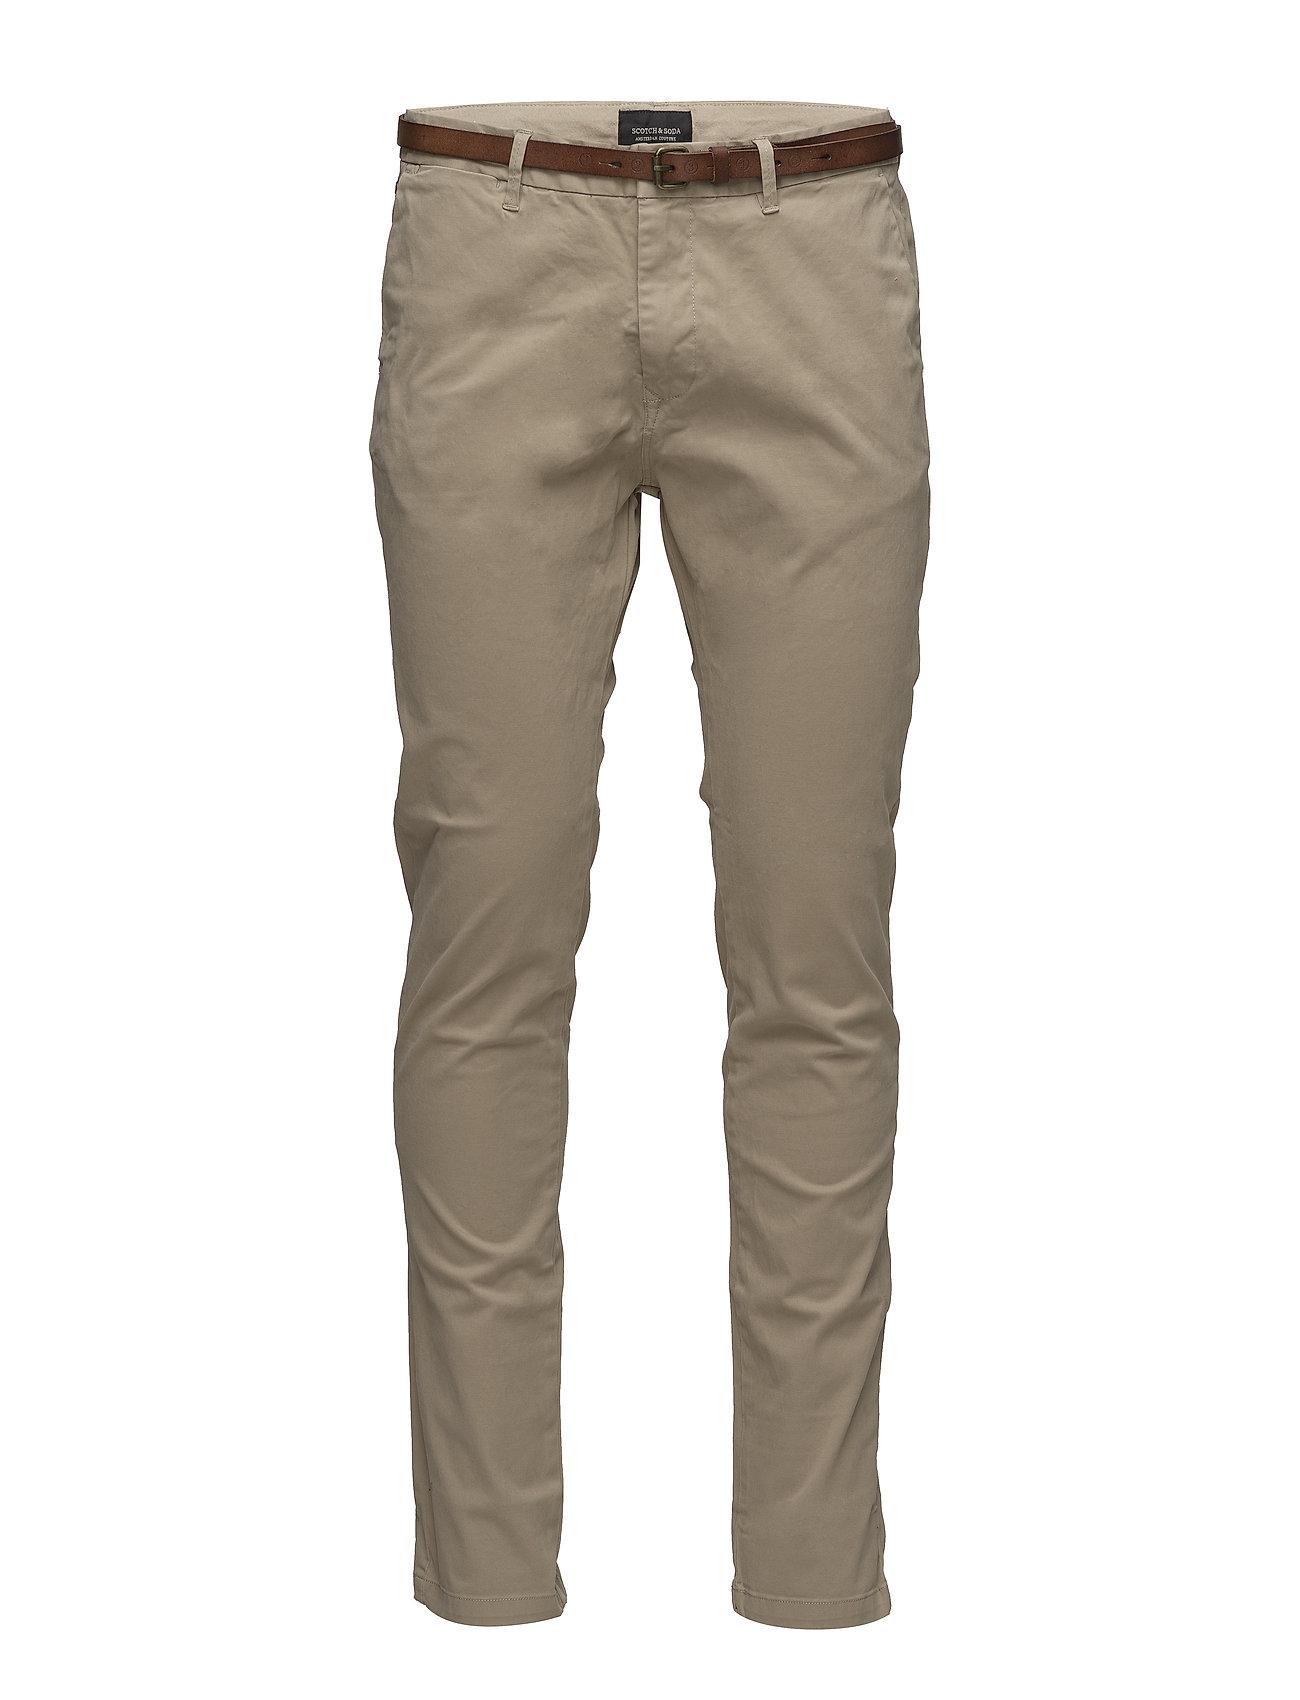 Scotch & Soda Slim fit cotton/elastan garment dyed chino pant - SAND